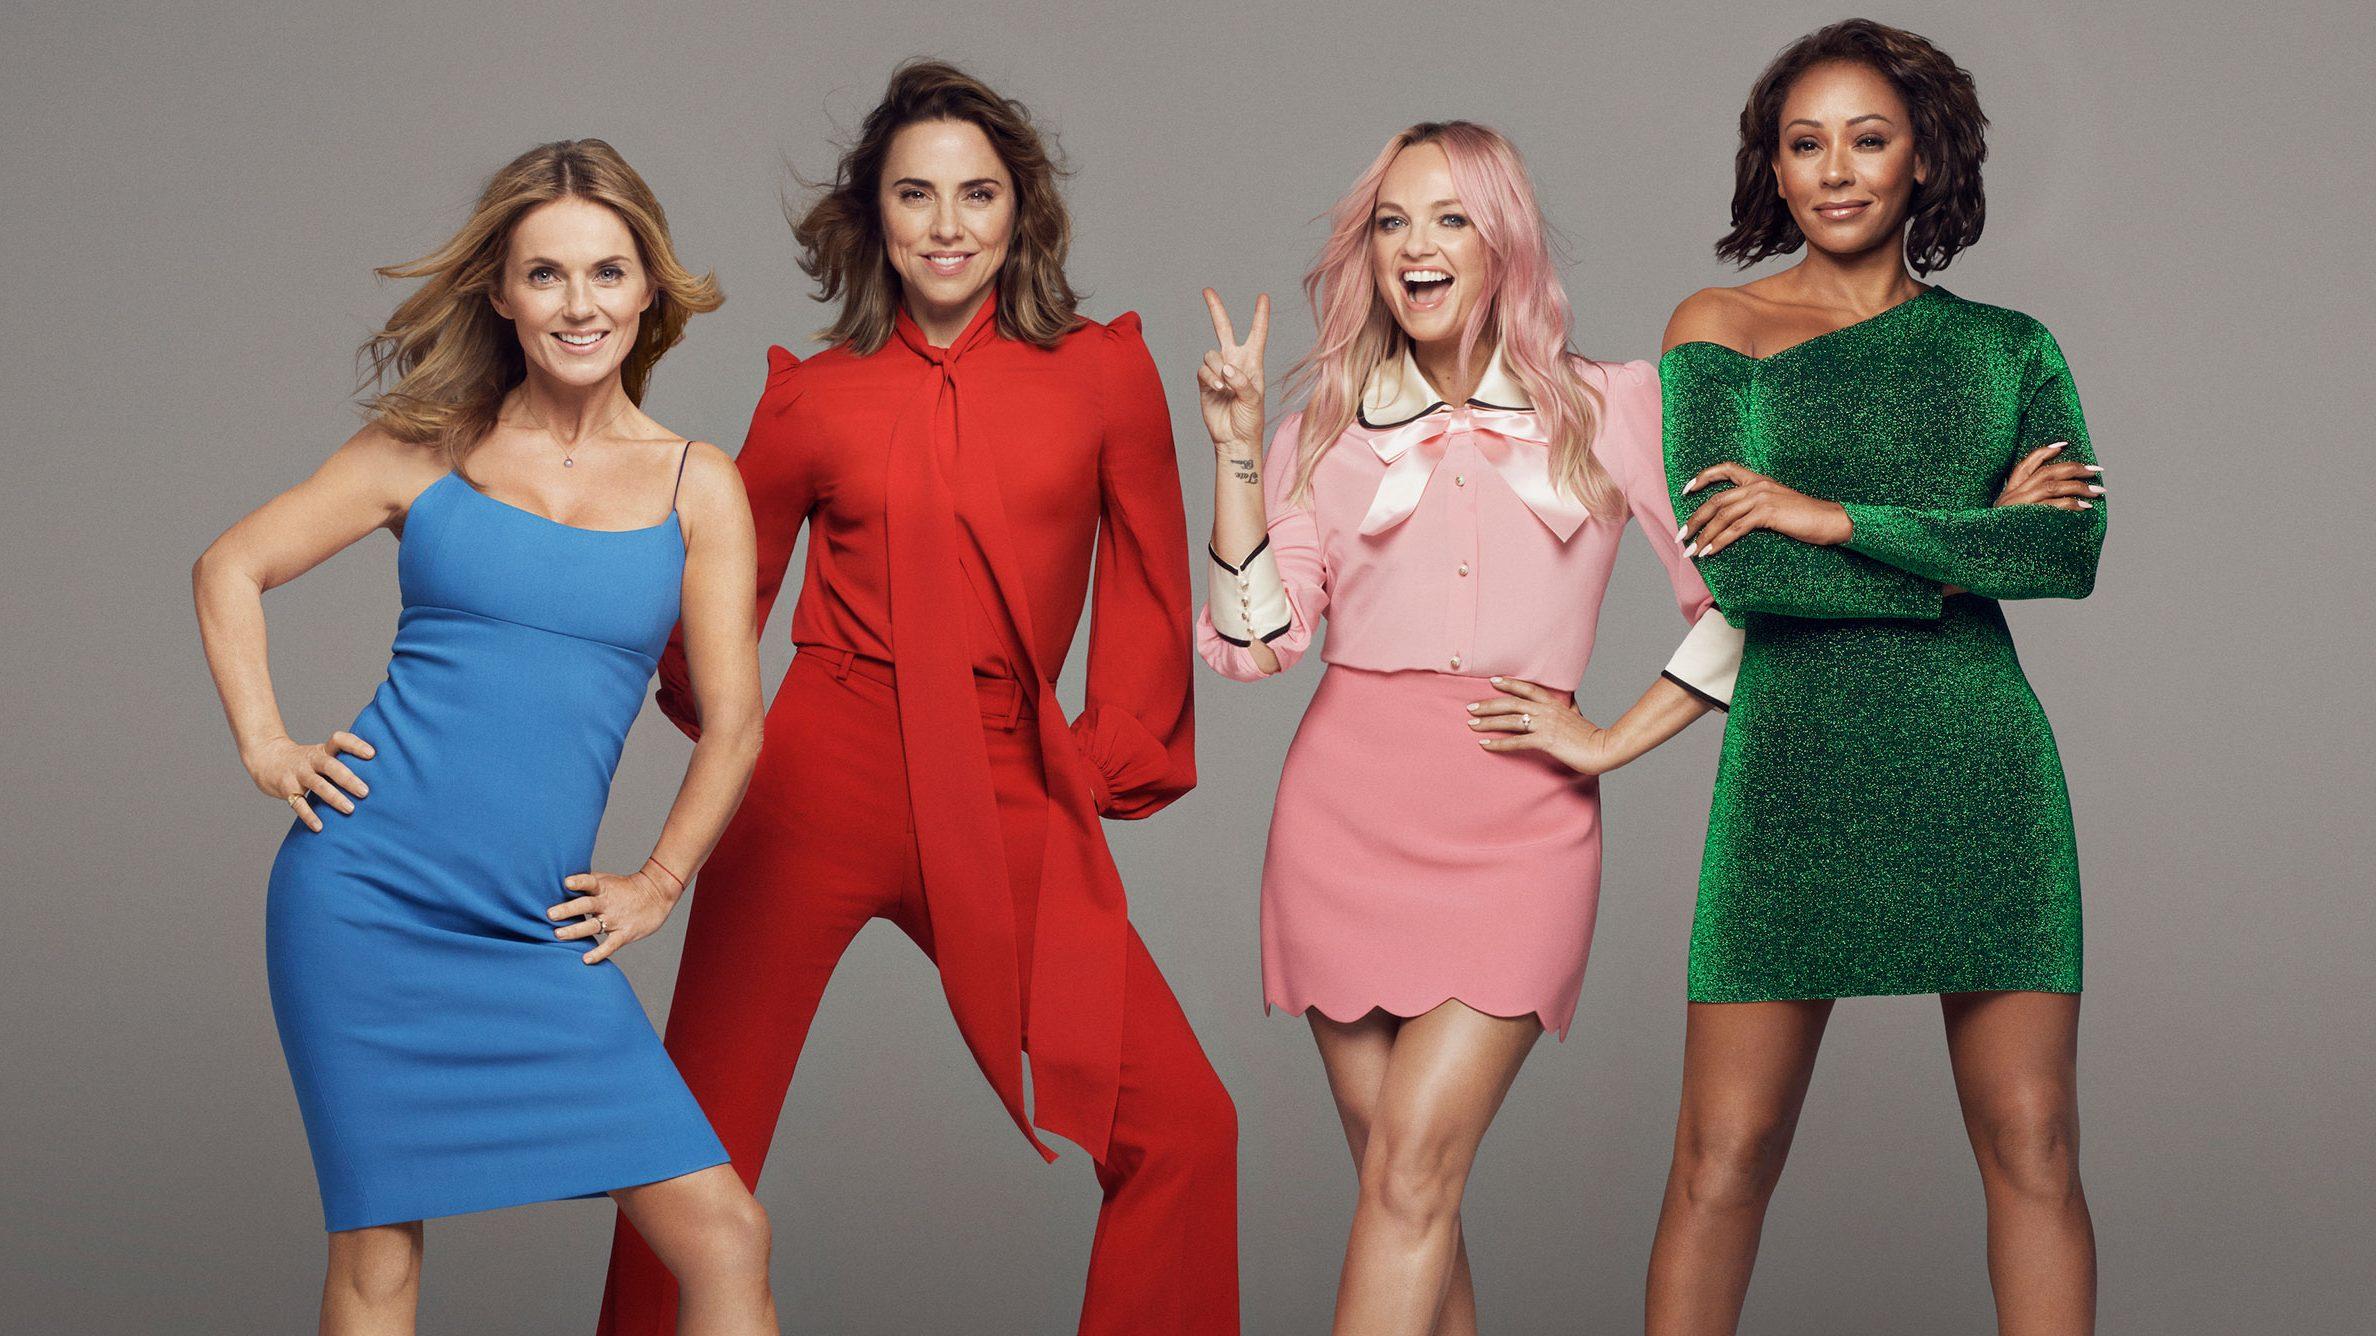 Spice Girls 2019 Reunion Press Photo